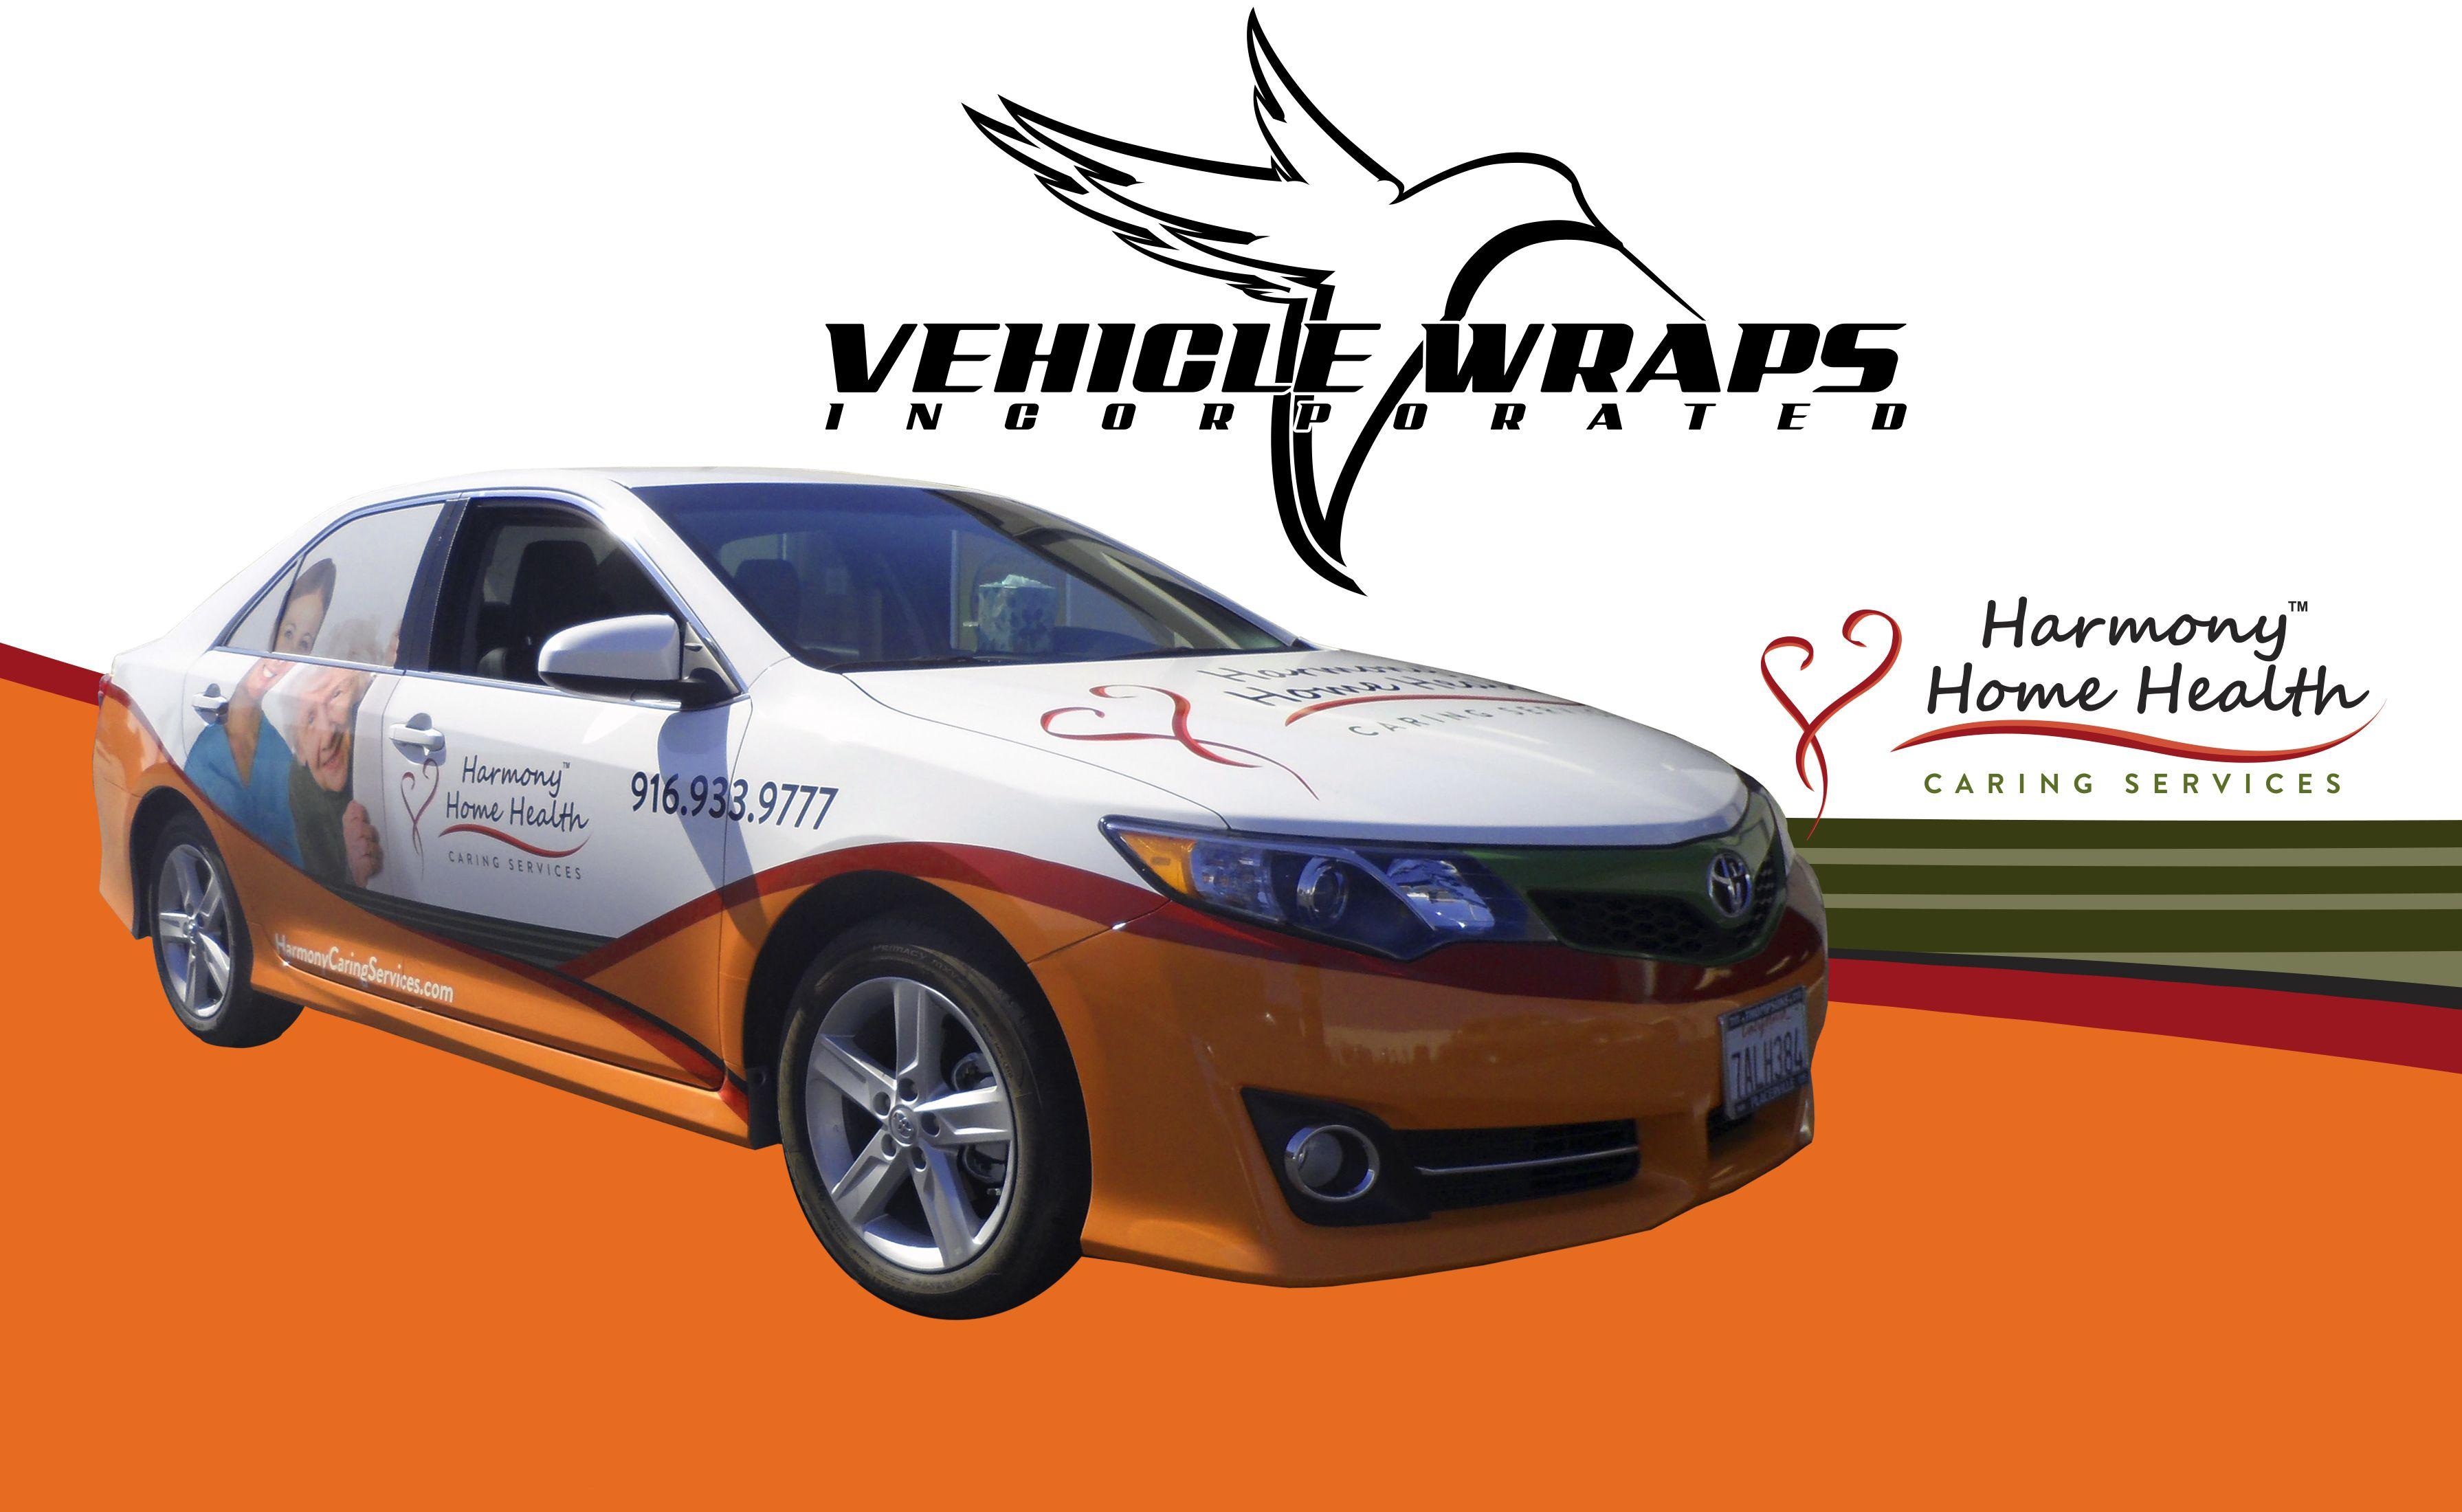 Partial Vehicle Wrap Car Harmony Home Health 3M